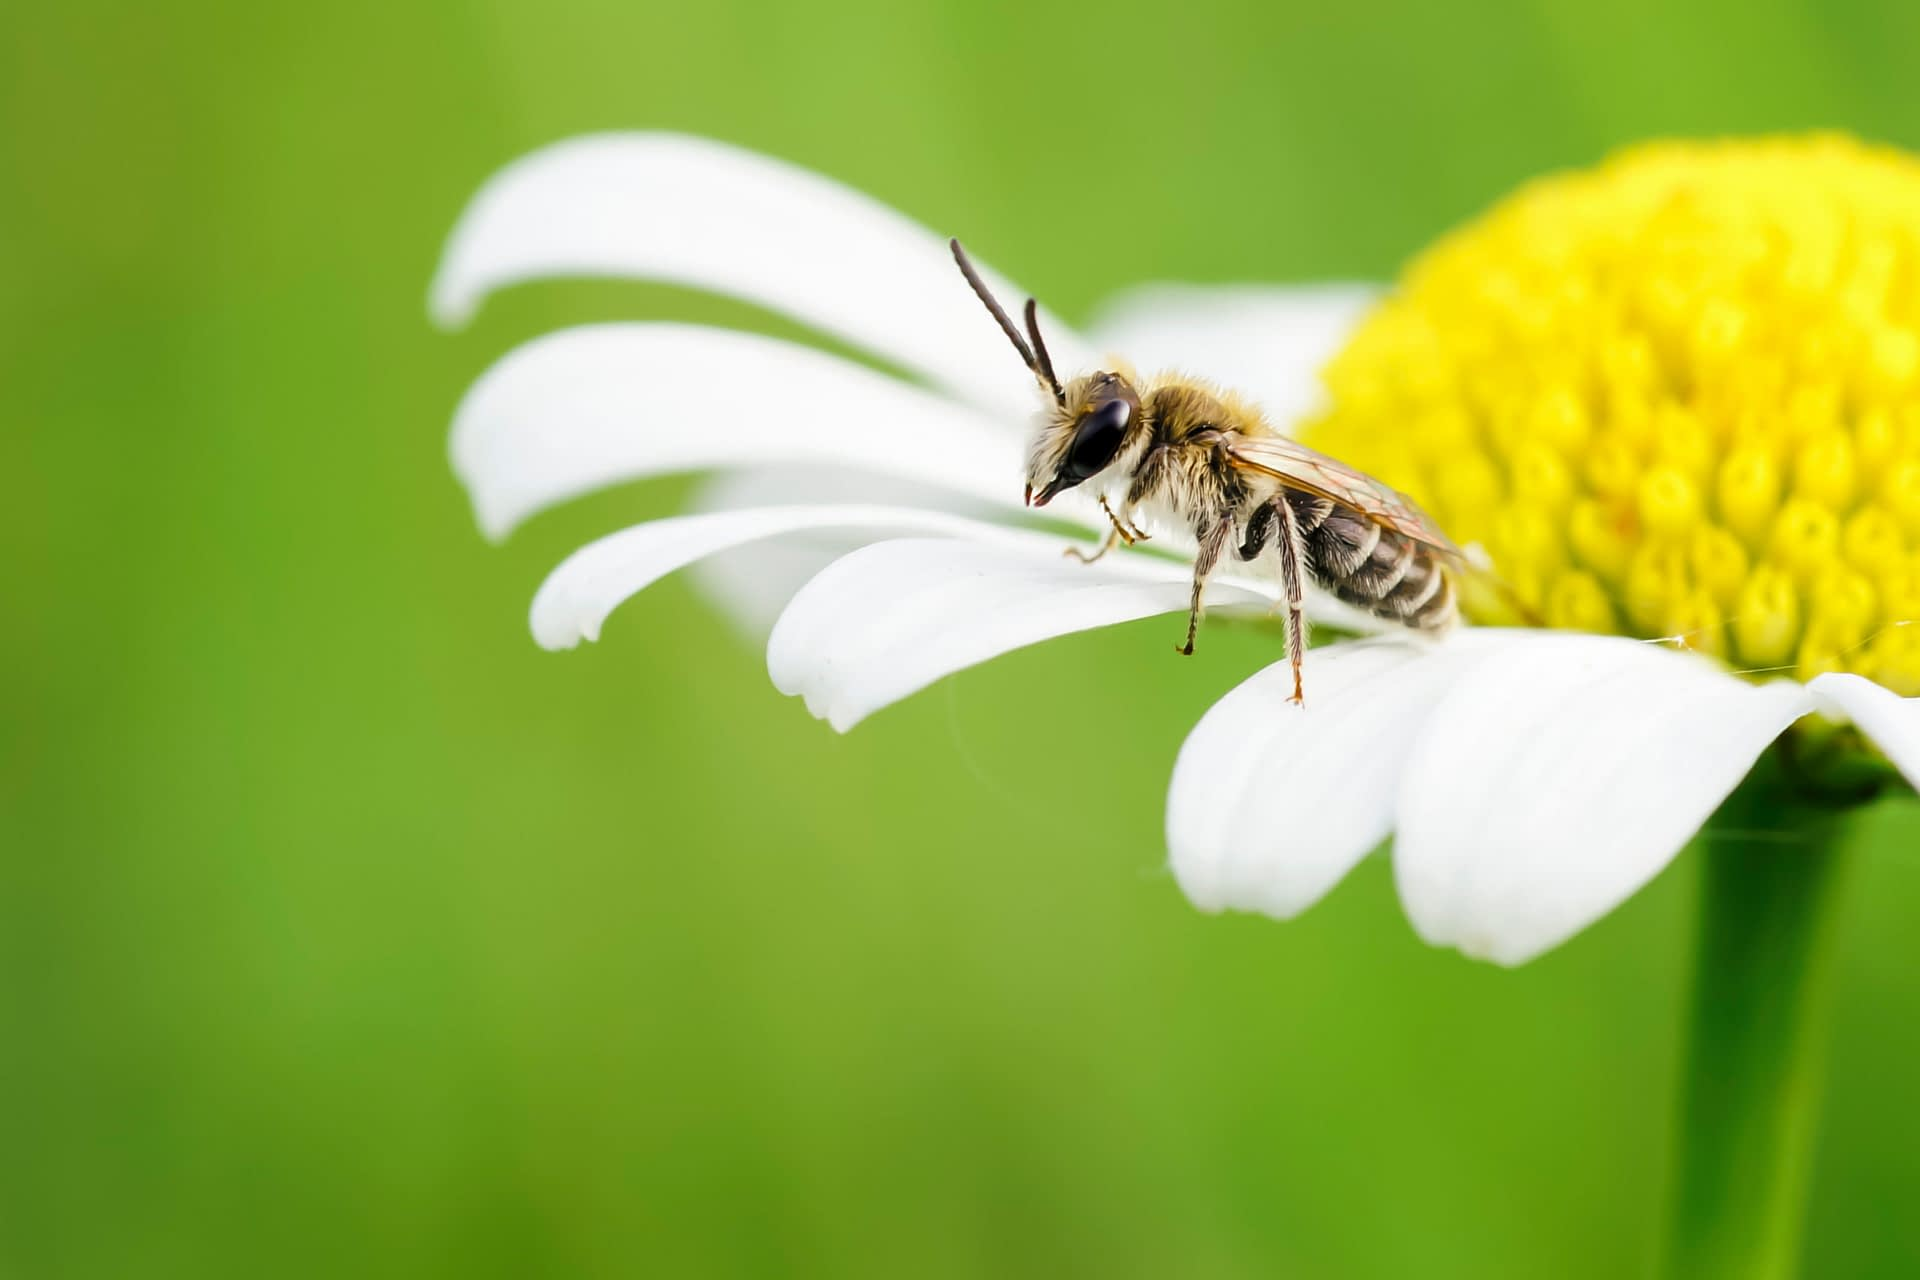 20,f10,ISO320 Biene Blume_00